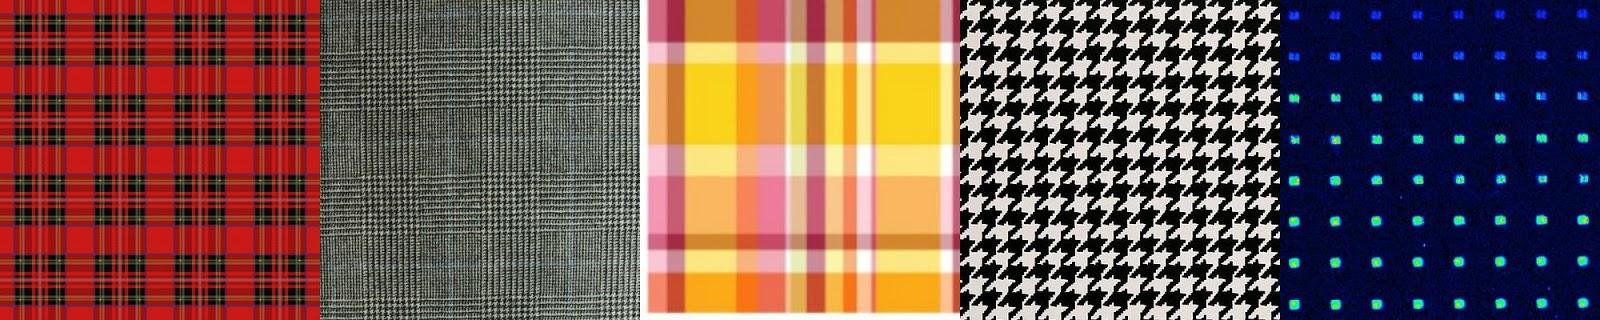 types_of_checkered_prints.jpg